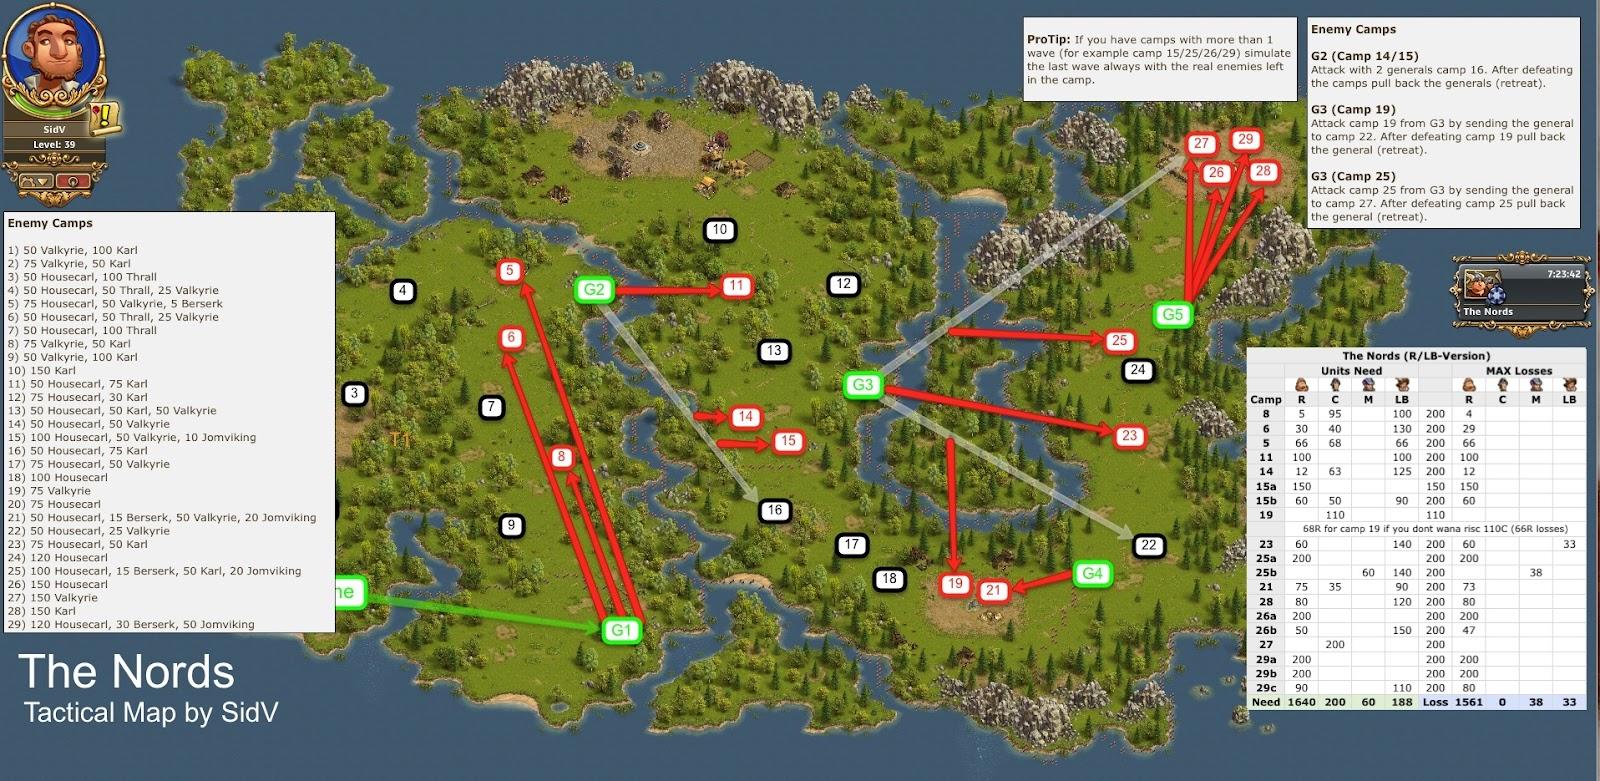 General ReTreat Atari 2600  online game  RetroGamescz